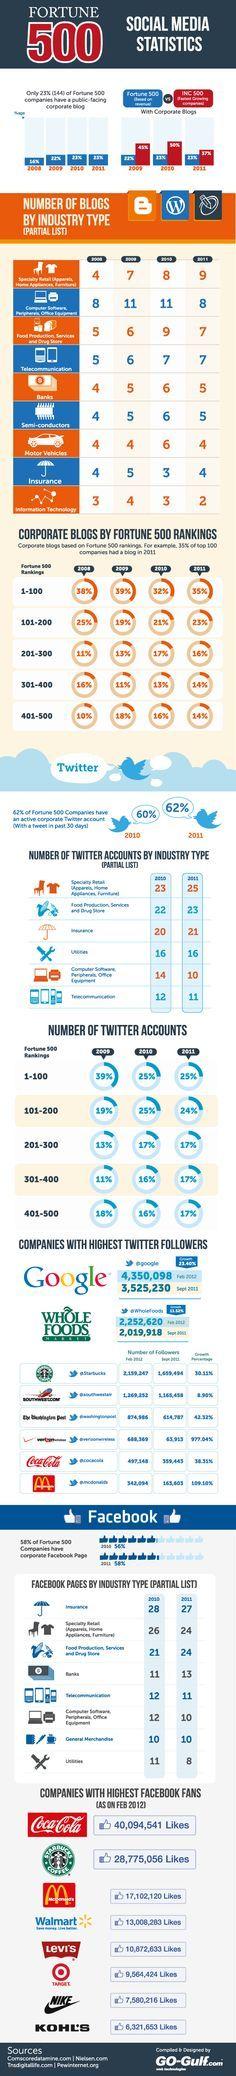 Zahlen, Daten, Fakten zur Social Media Welt in Deutschland - Berufsziel Social Media